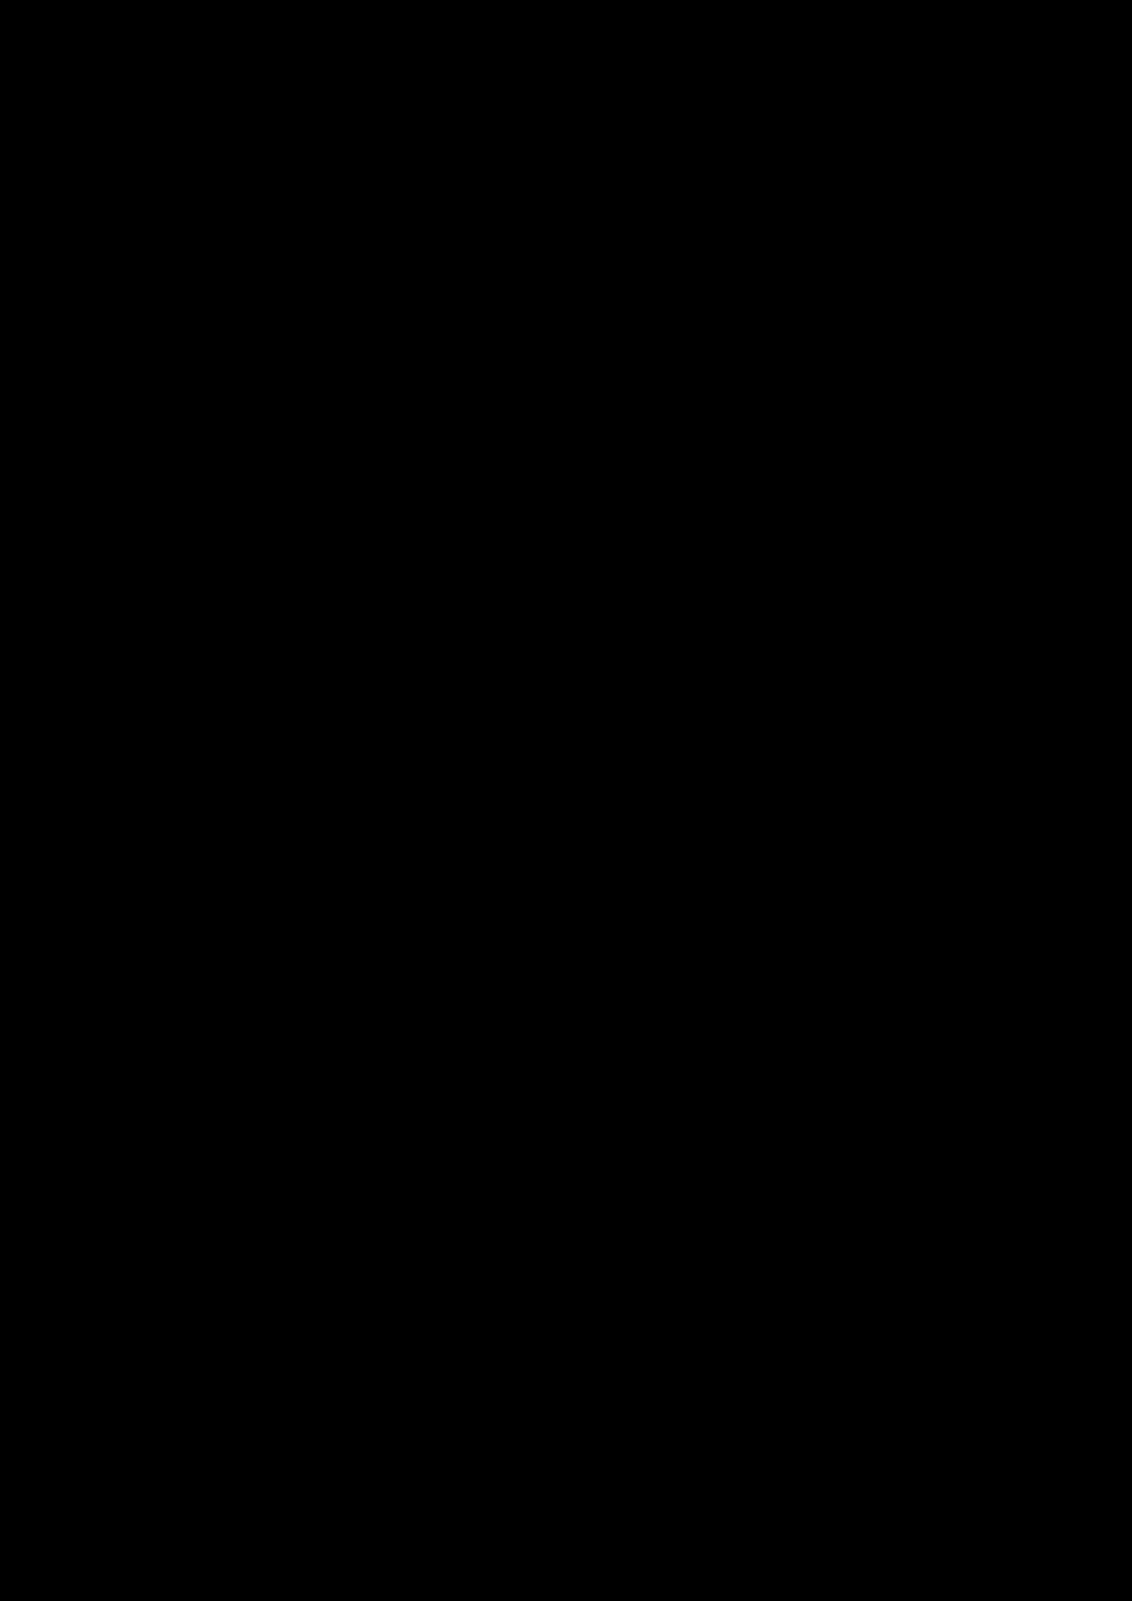 Korolevstvo slez slide, Image 48